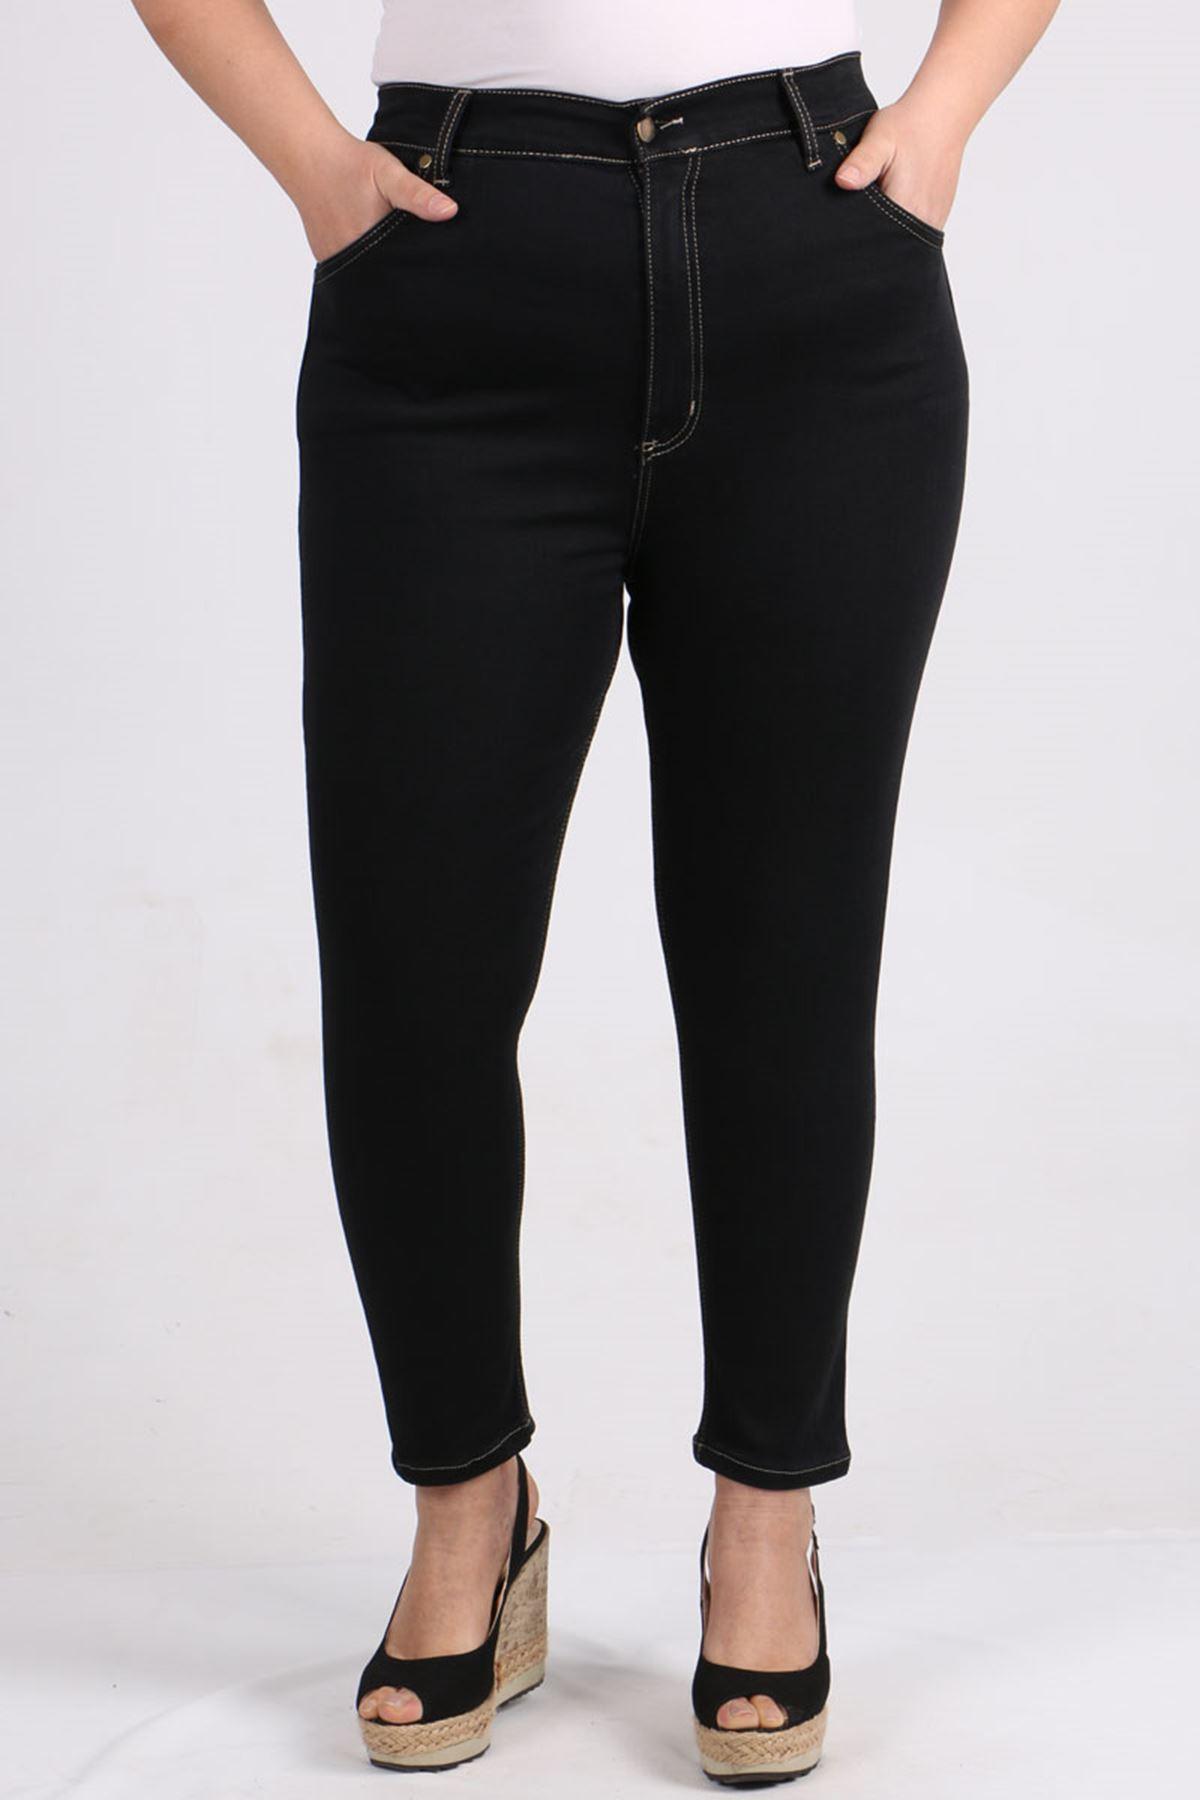 9107-1 Plus Size Skinny Leg Jeans - Black